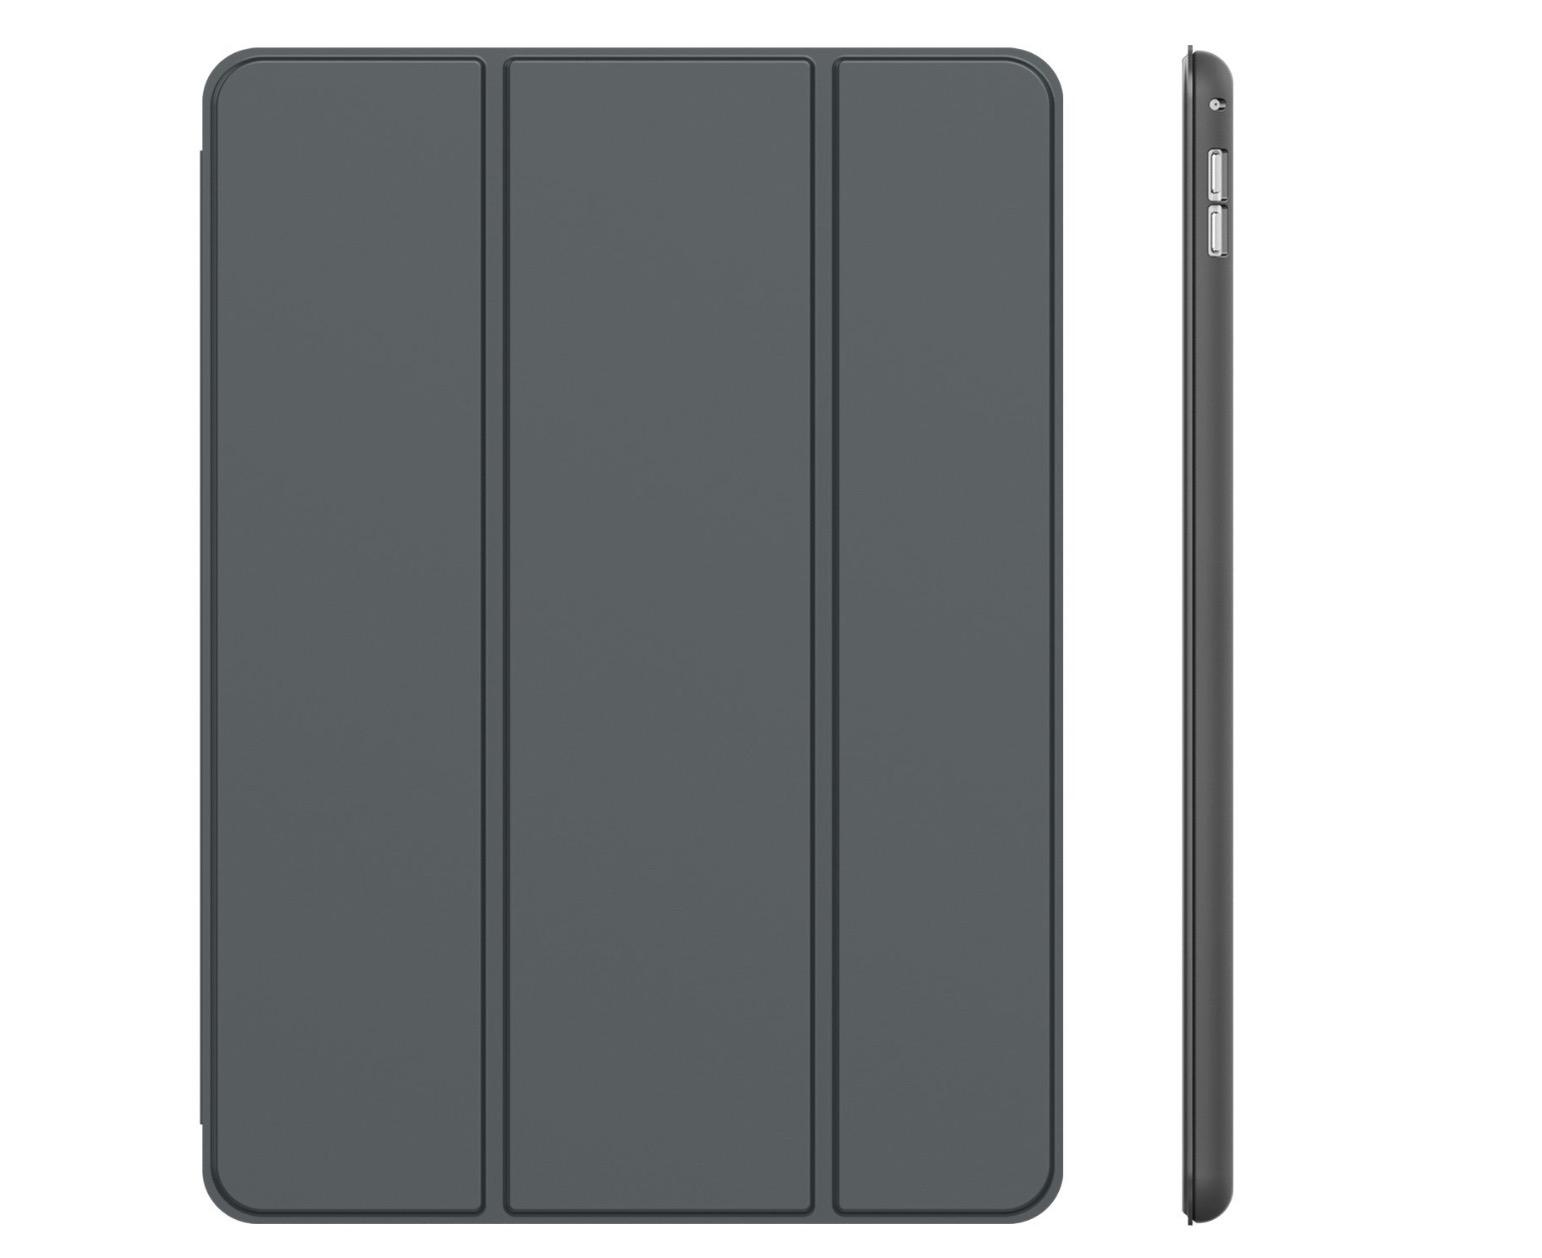 cover iPad pro 12.9